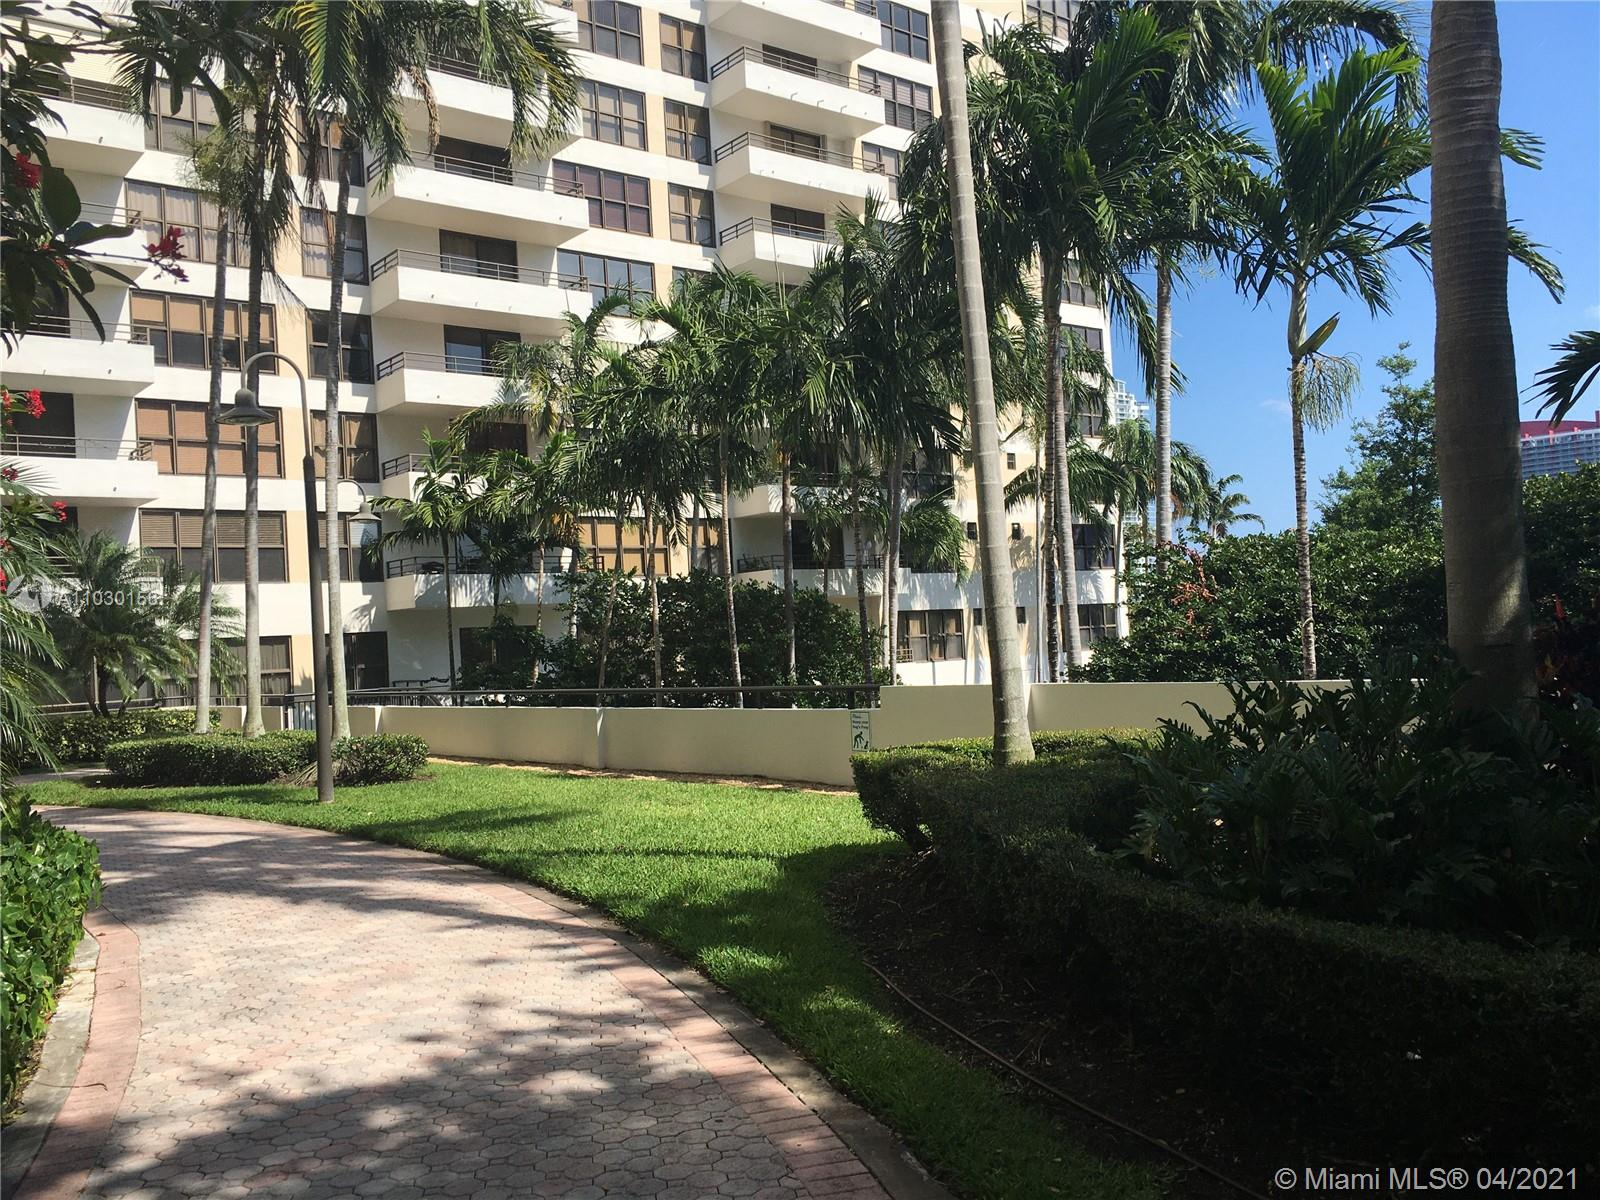 Photo of 2500 Parkview Dr #1108, Hallandale Beach, Florida, 33009 - Gardens